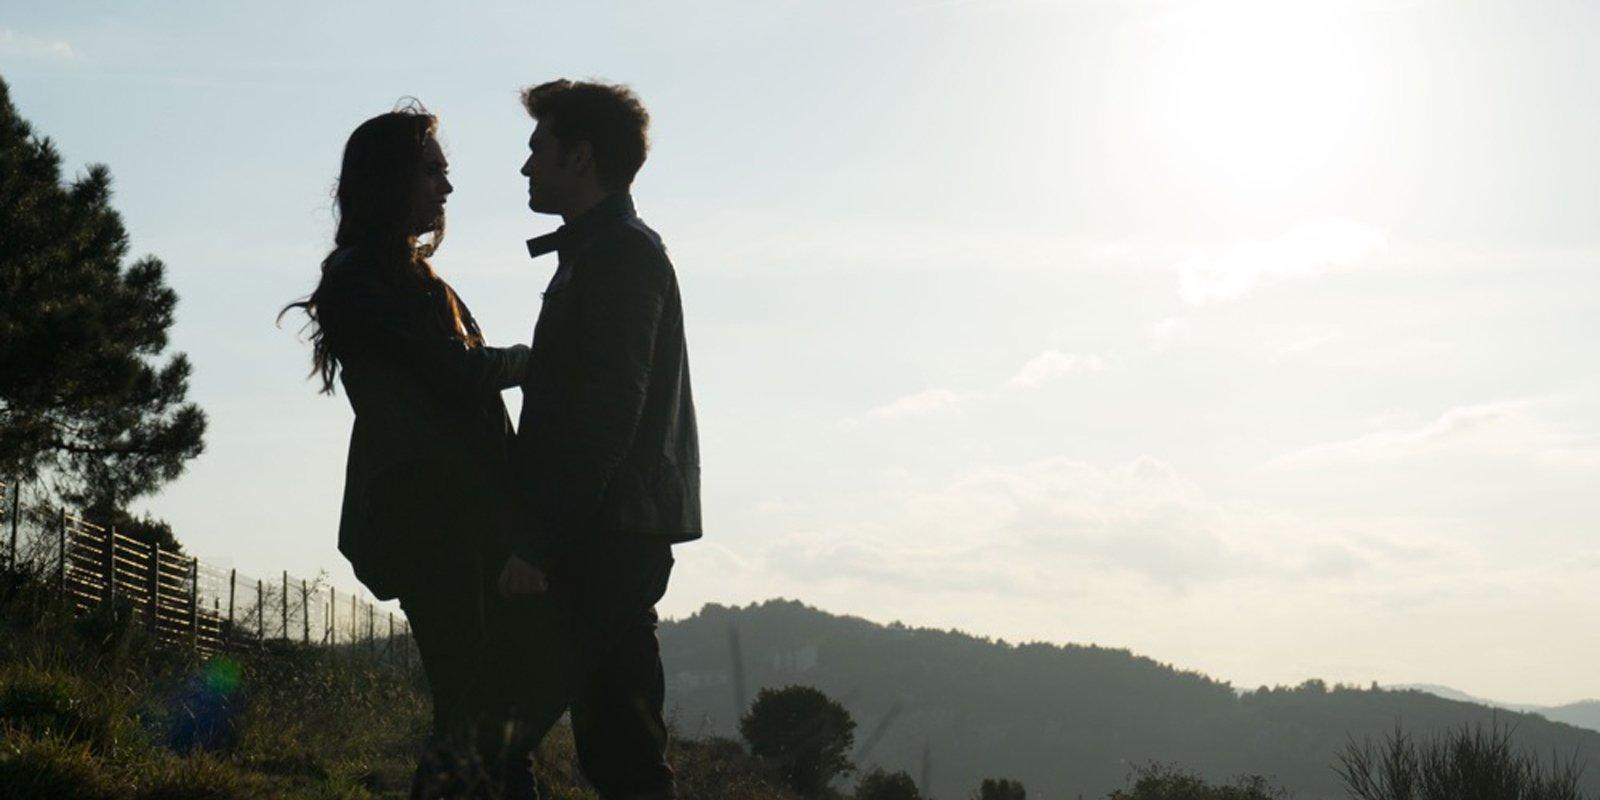 Кадр из фильма «Али». Режиссер Рамазан Озер. 2019 год